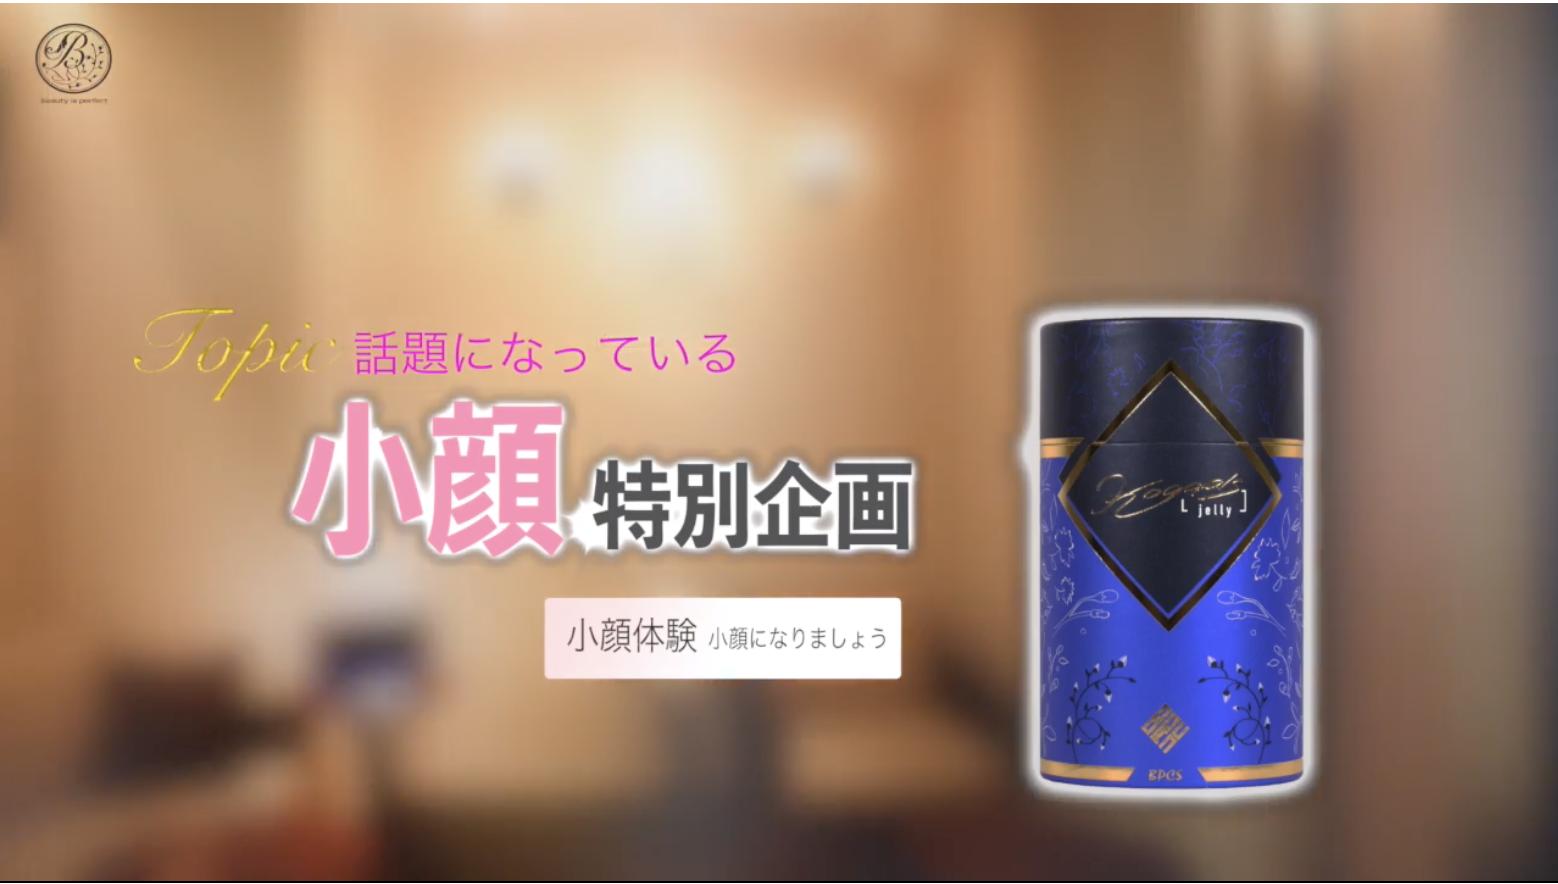 Kogao's 紹介動画アップしました!